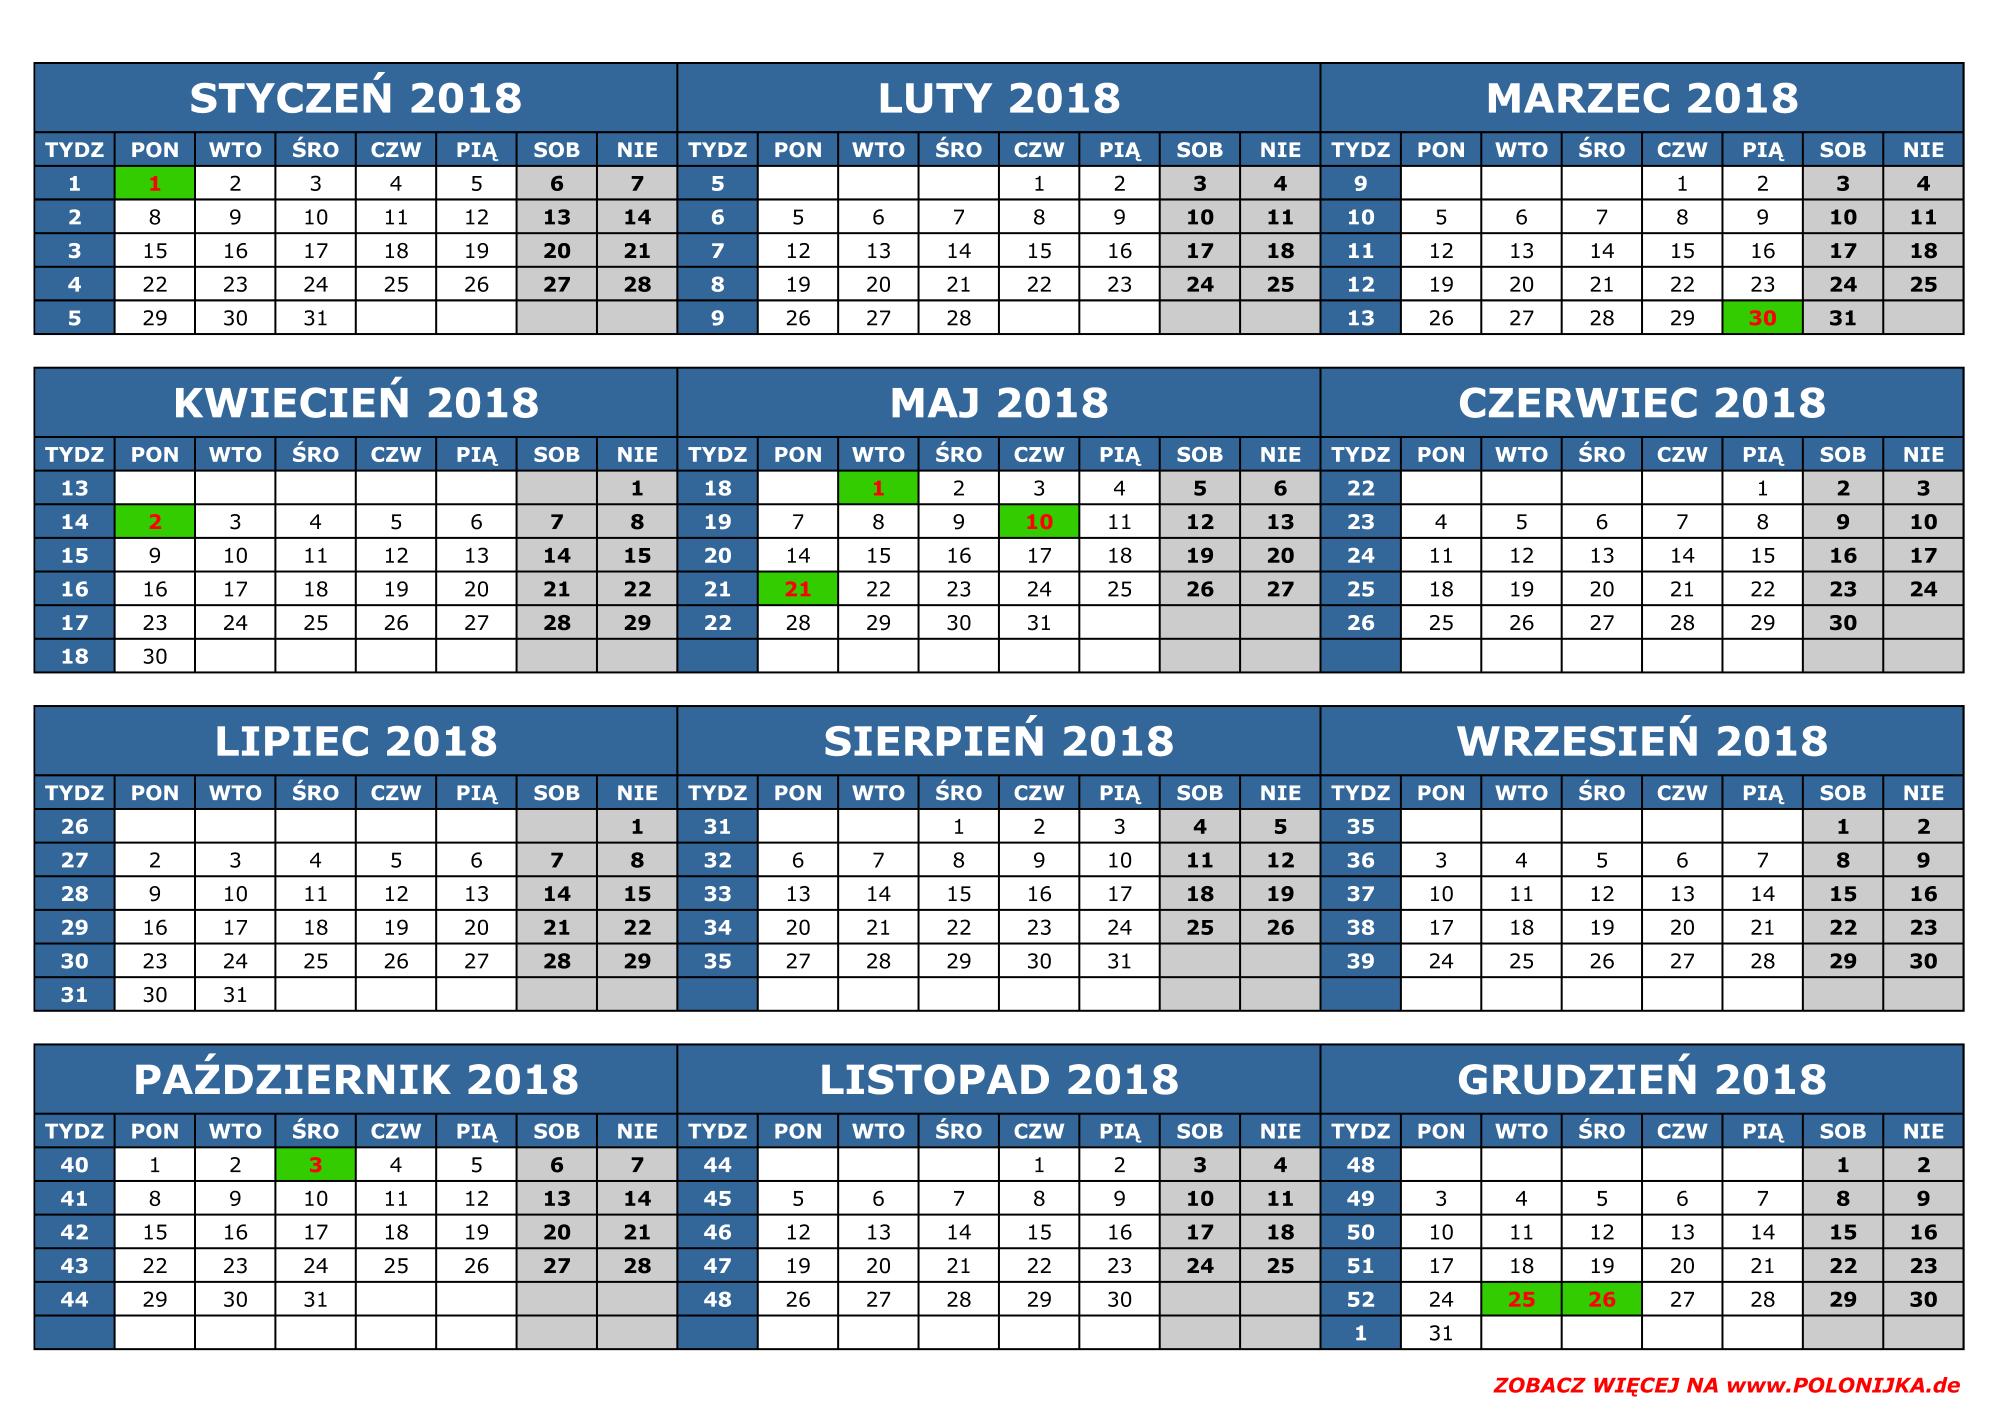 Kalendarz 2018 (Niemcy, Land: Baden-Württemberg / Badenia